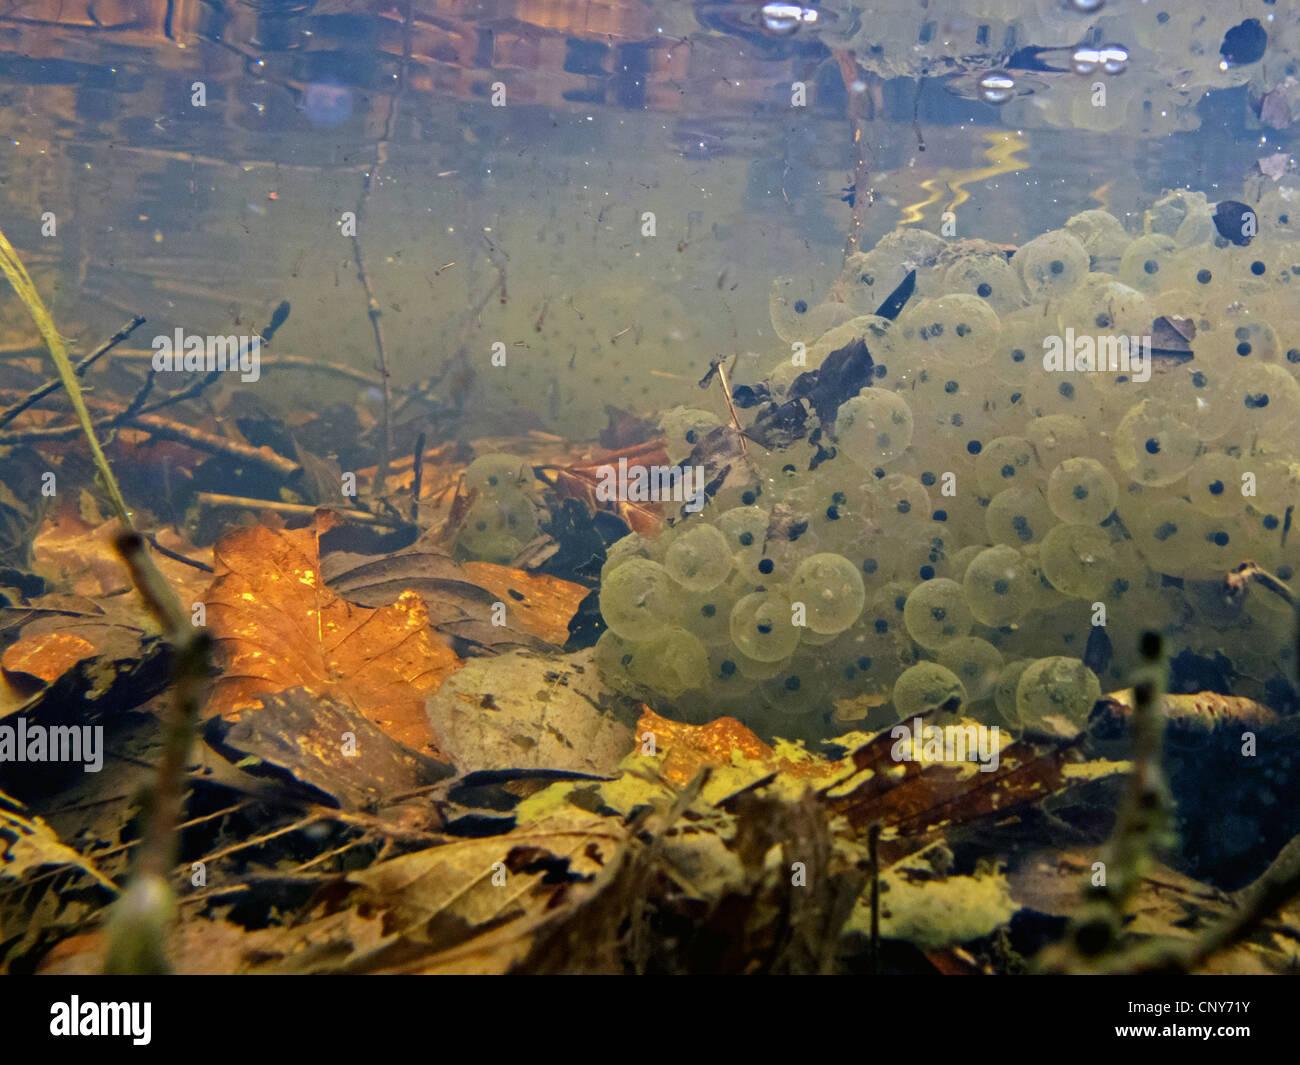 common frog, grass frog (Rana temporaria), spawn clumps, Germany, Bavaria - Stock Image